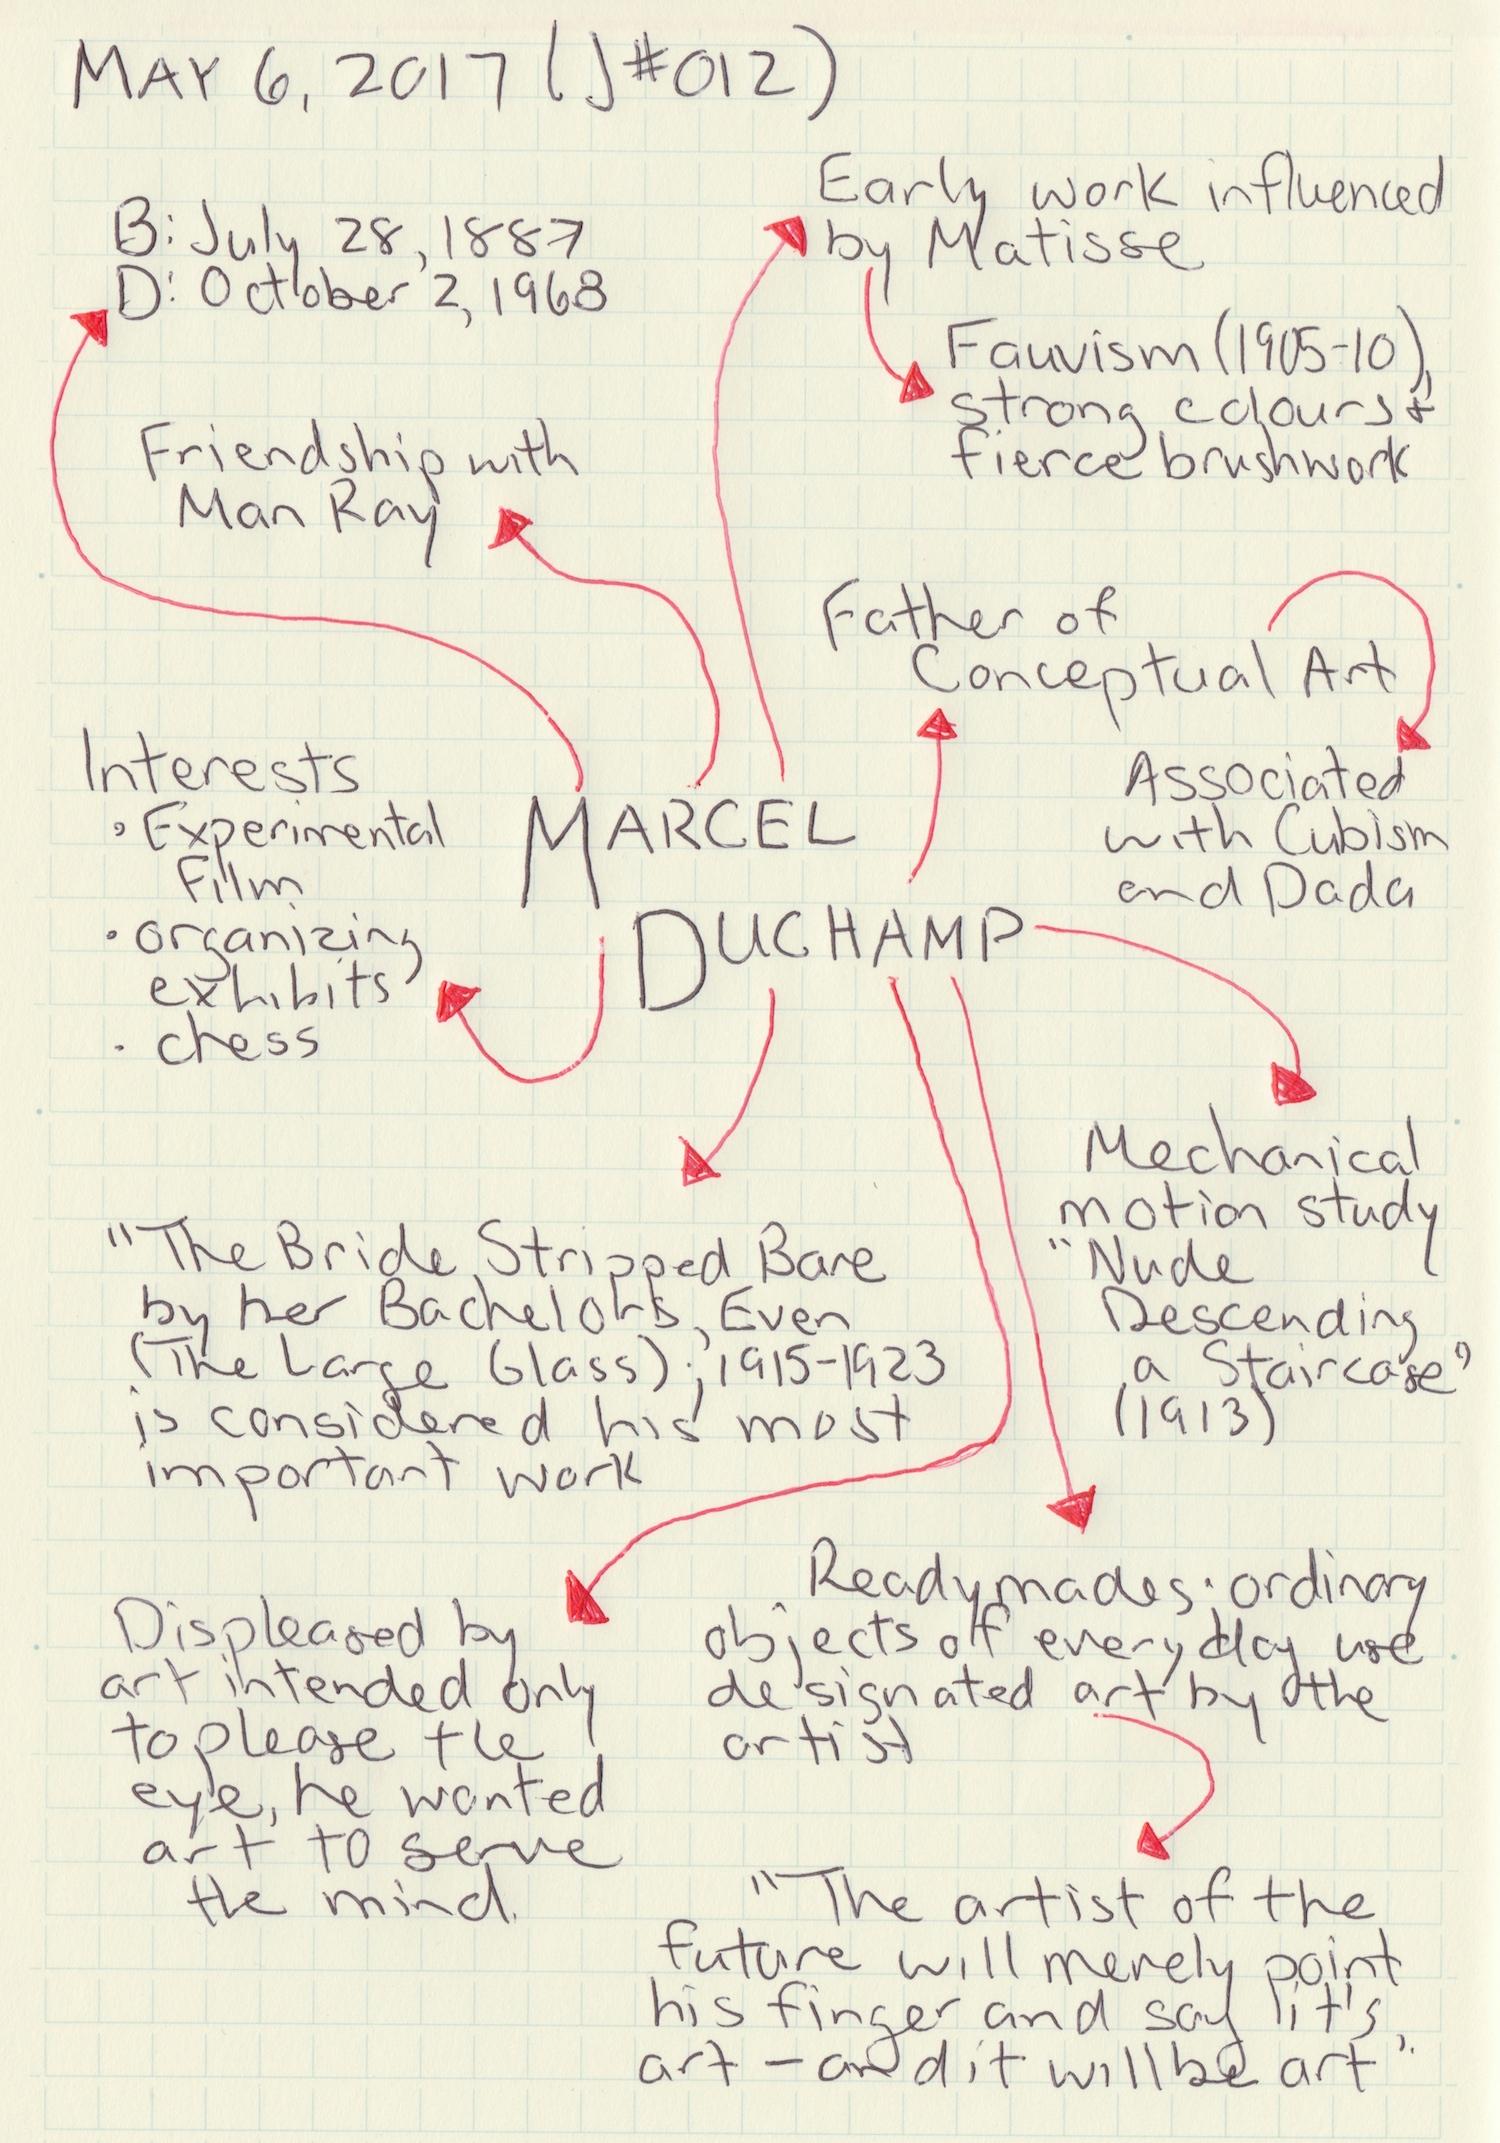 Marcel Duchamp; May 6, 2017 Journal #012